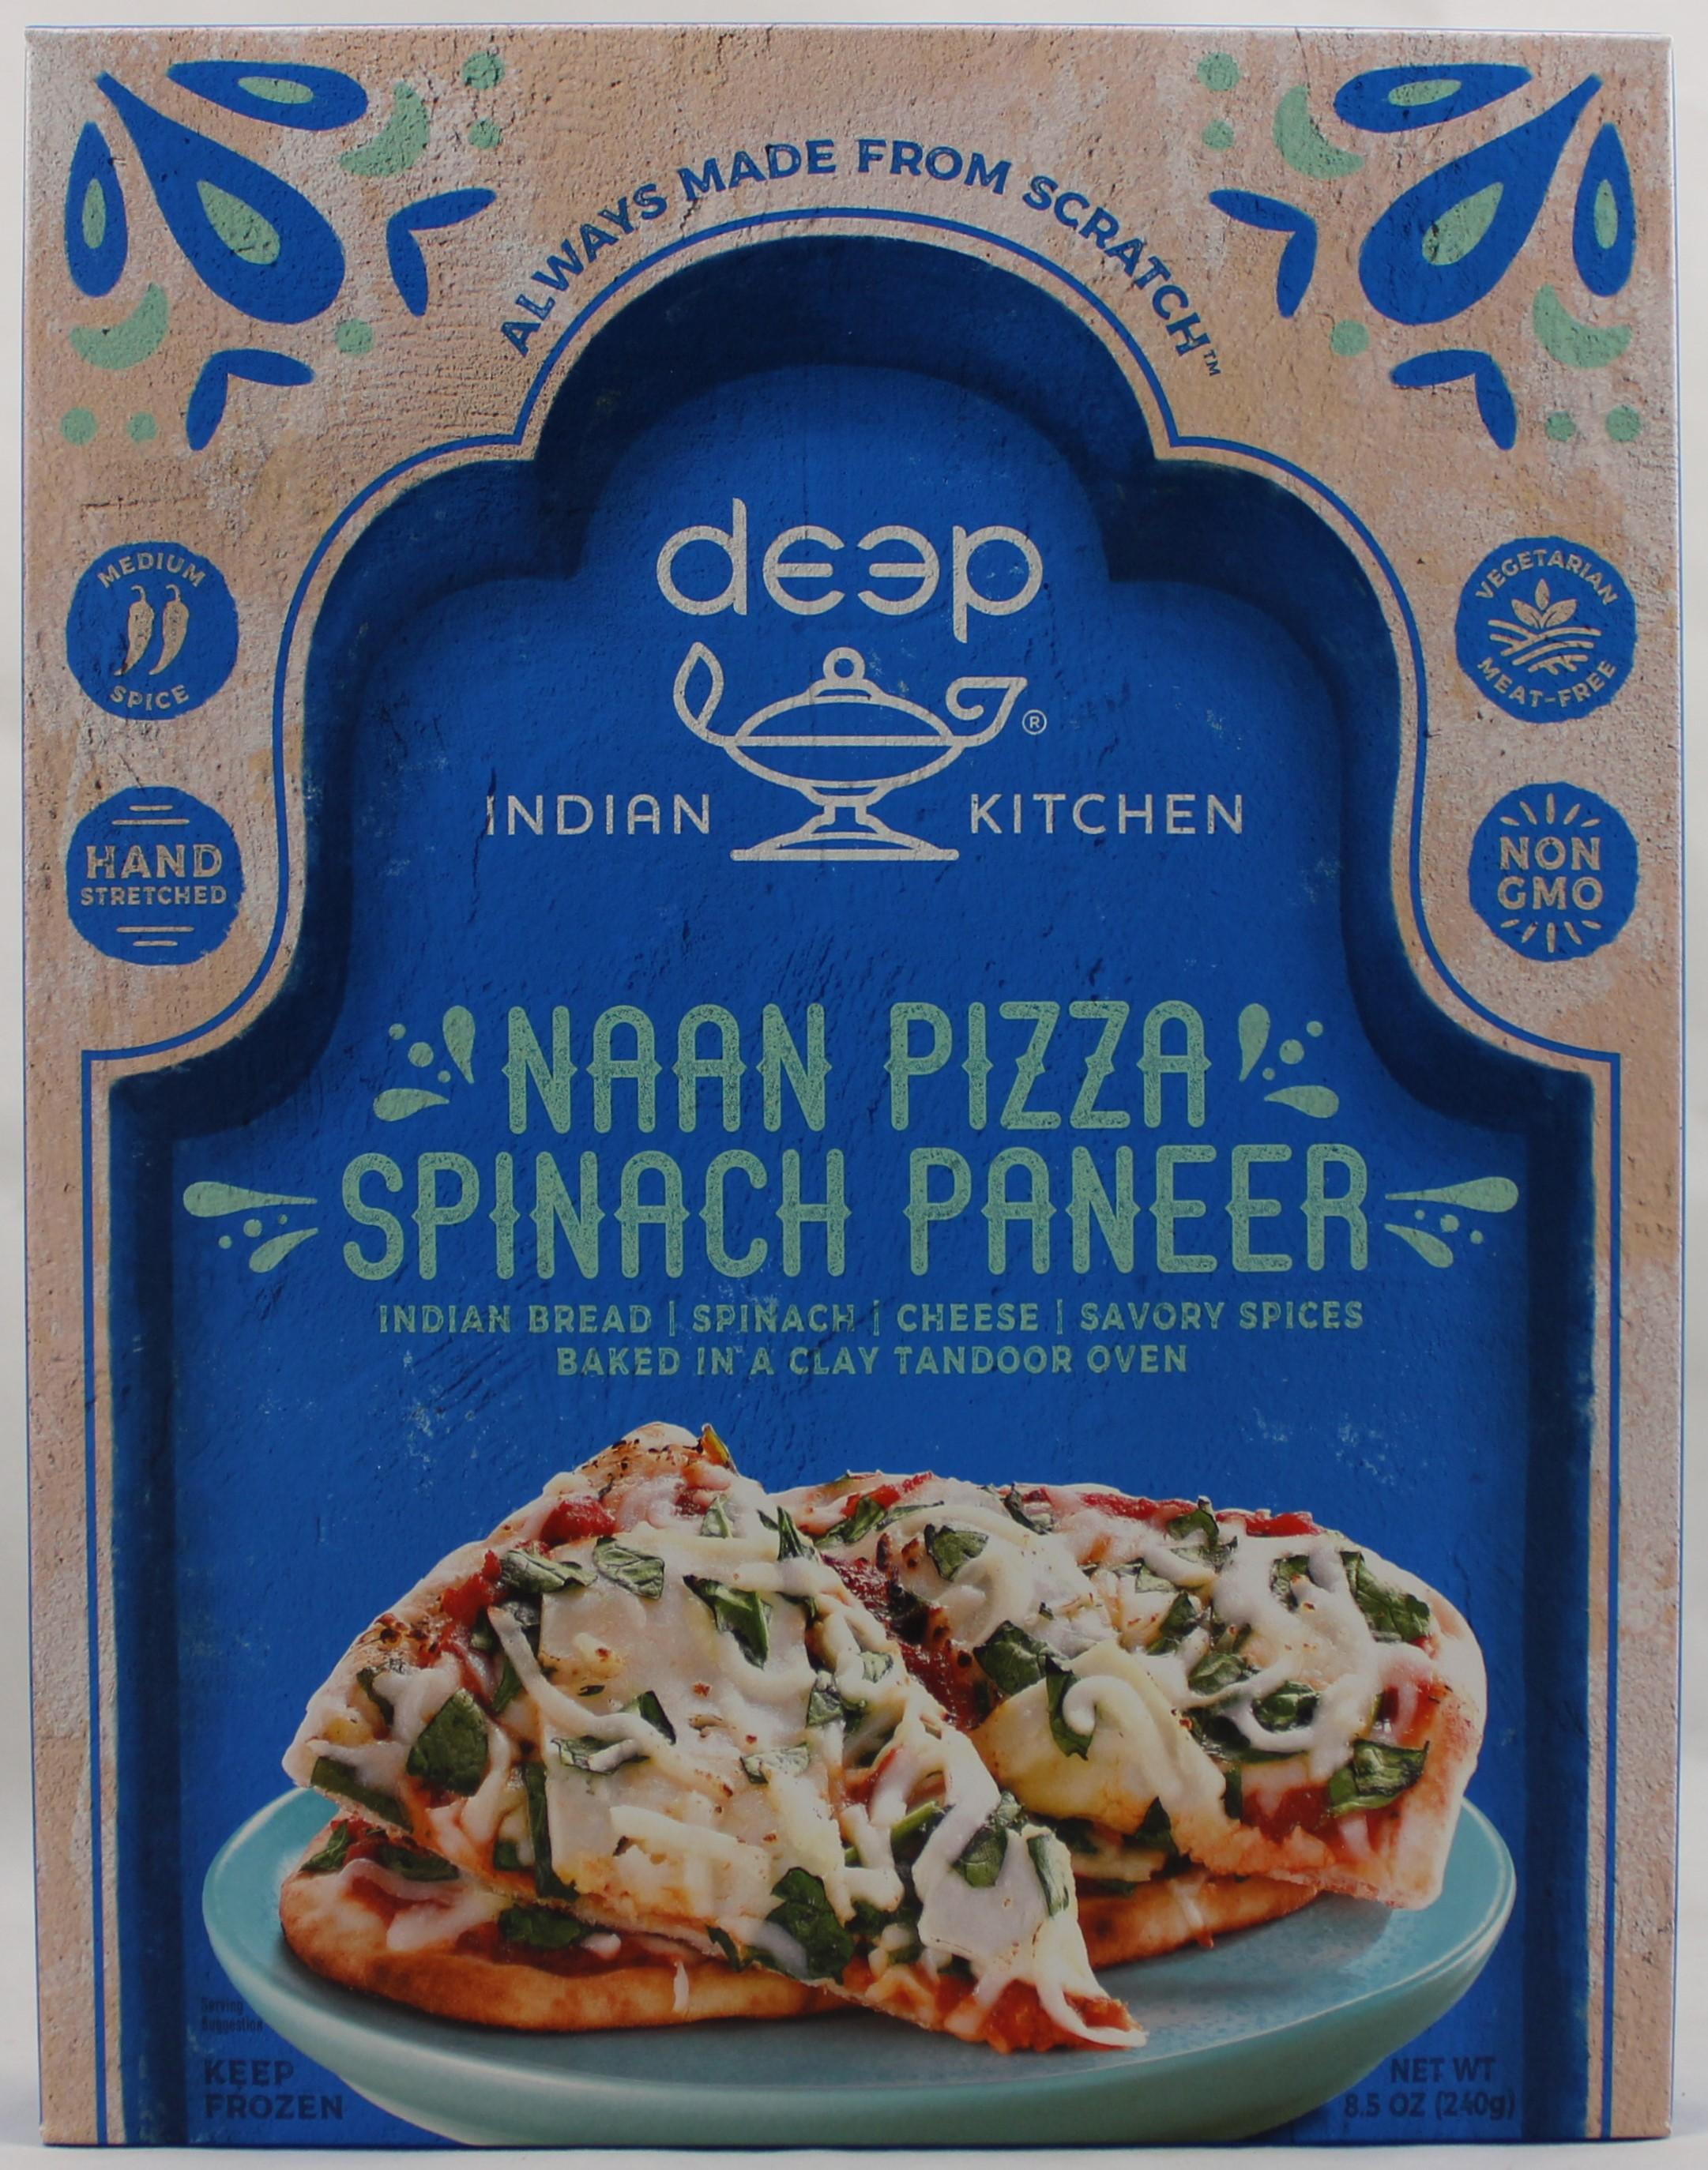 Spniach & Paneer Cheese Pizza 8.5oz